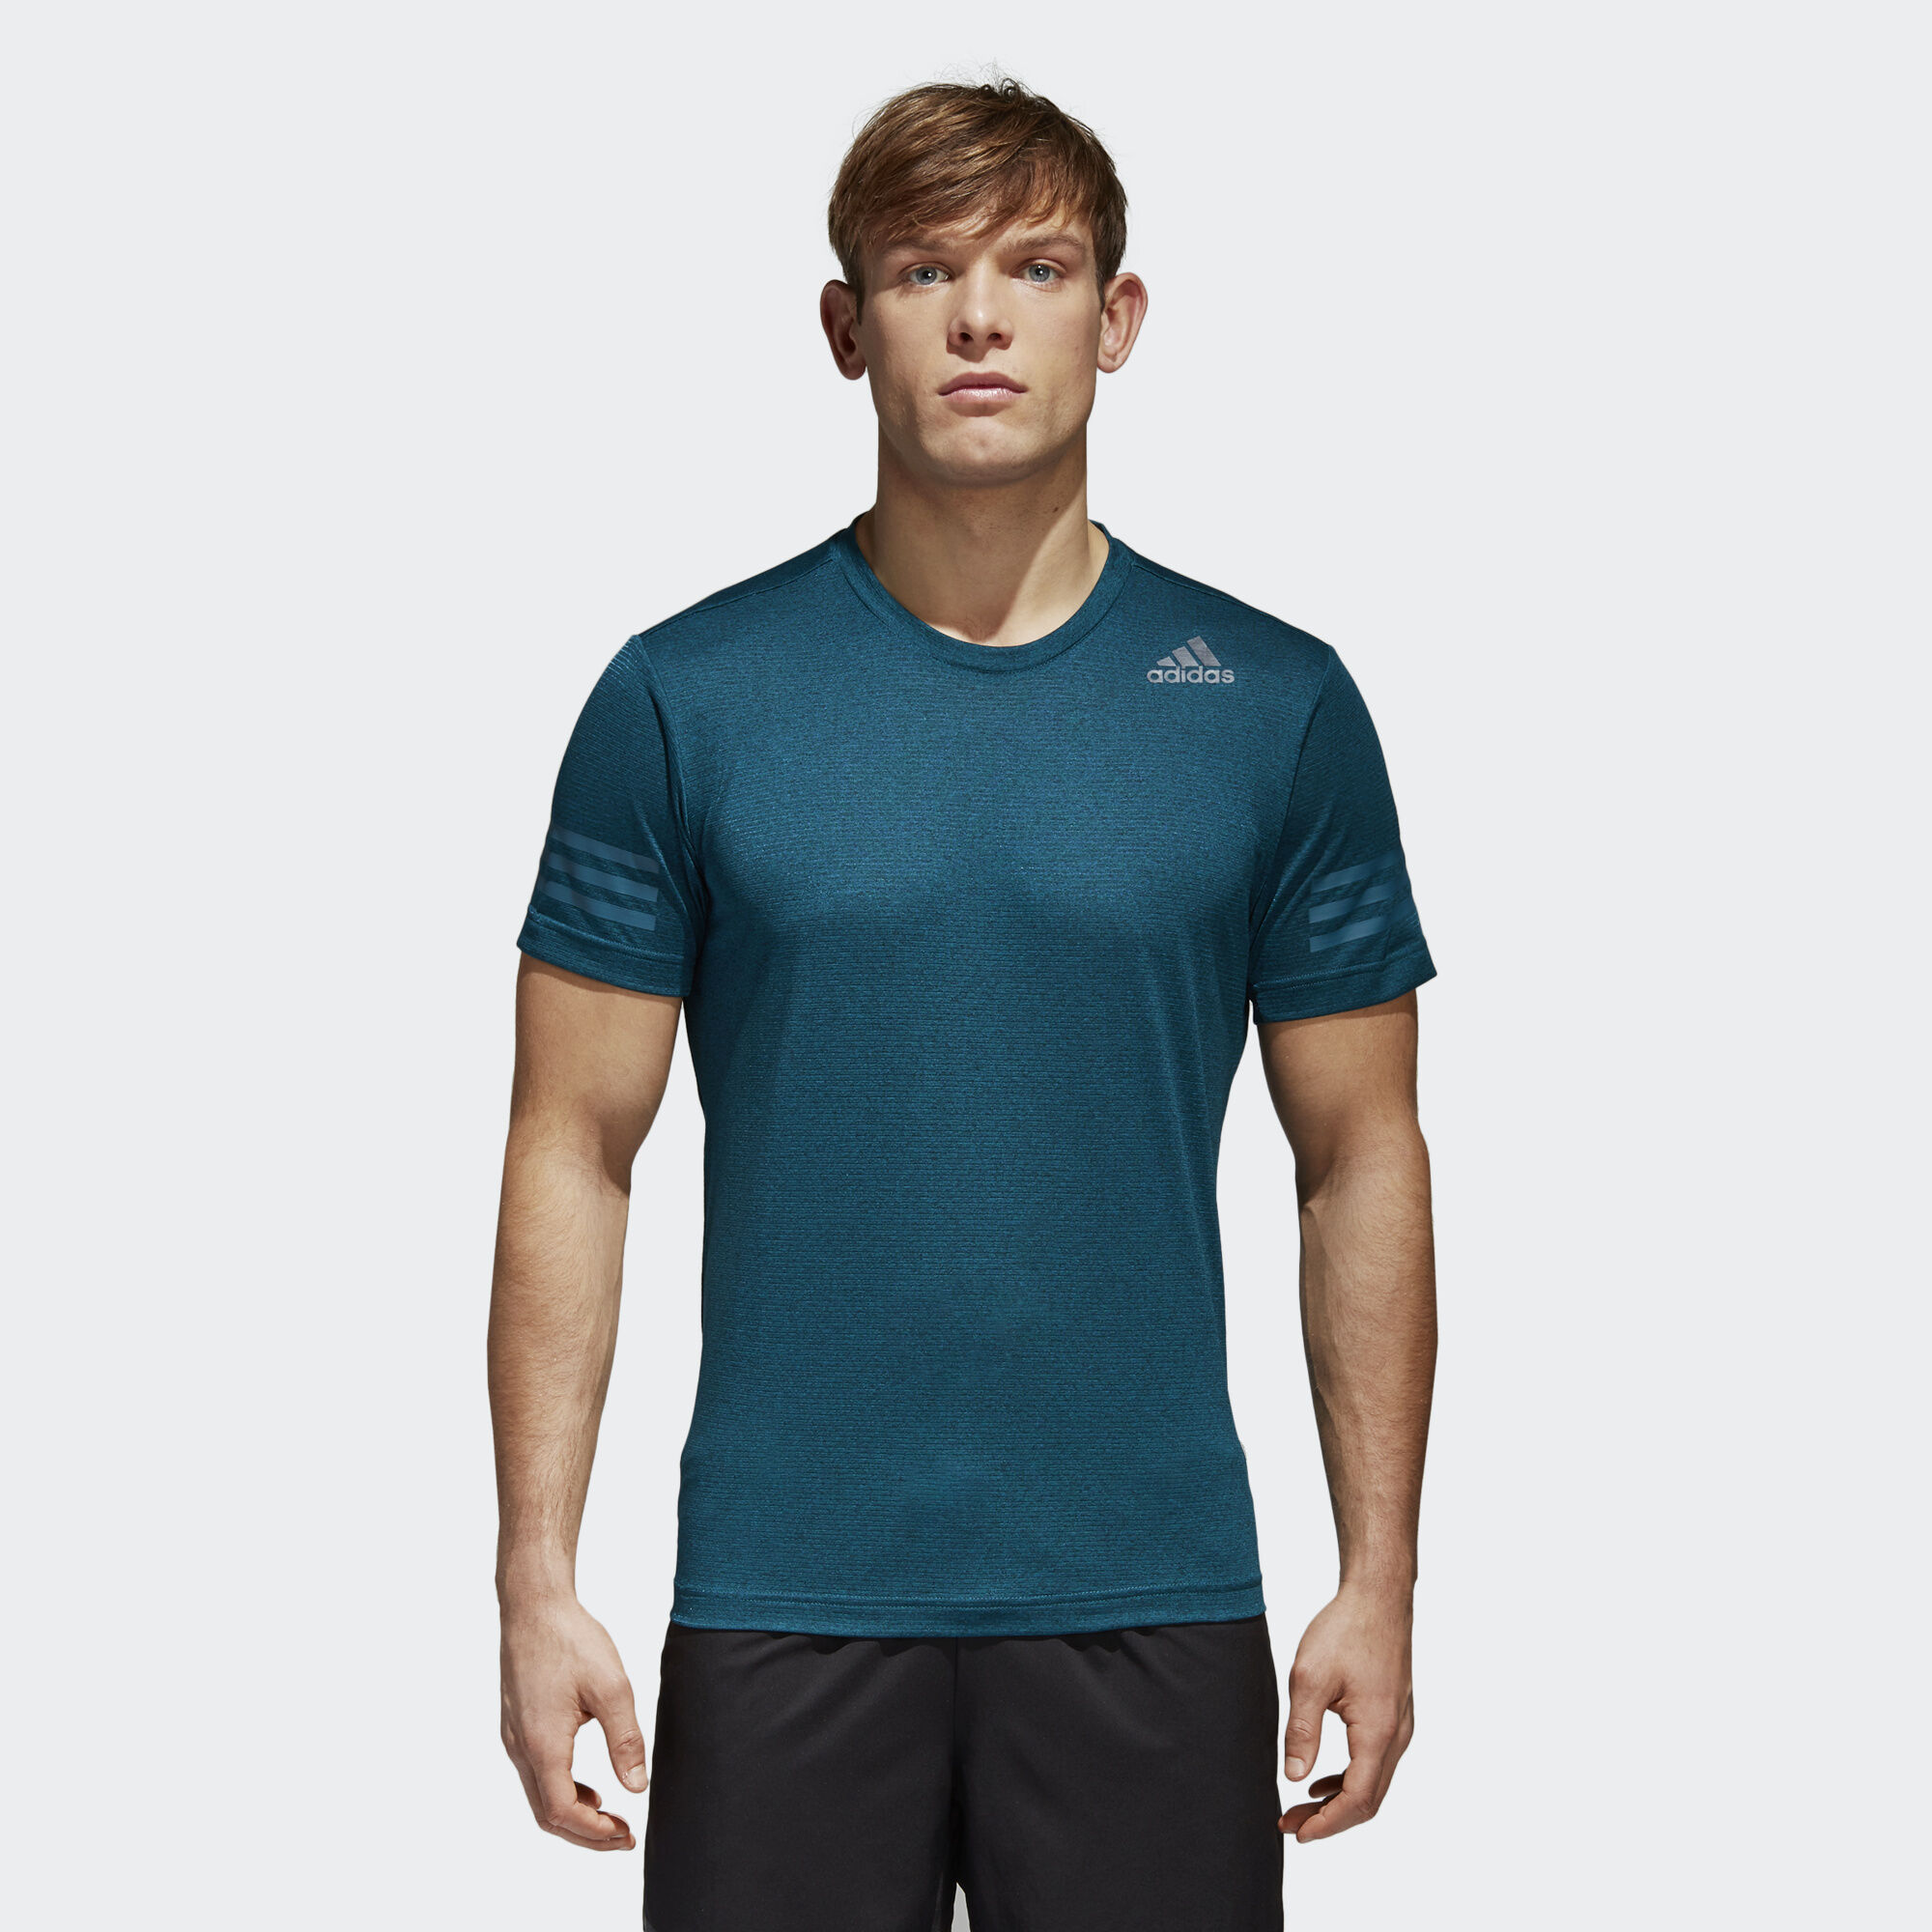 adidas - FreeLift Climacool Tee Blue CE0862. Men Training